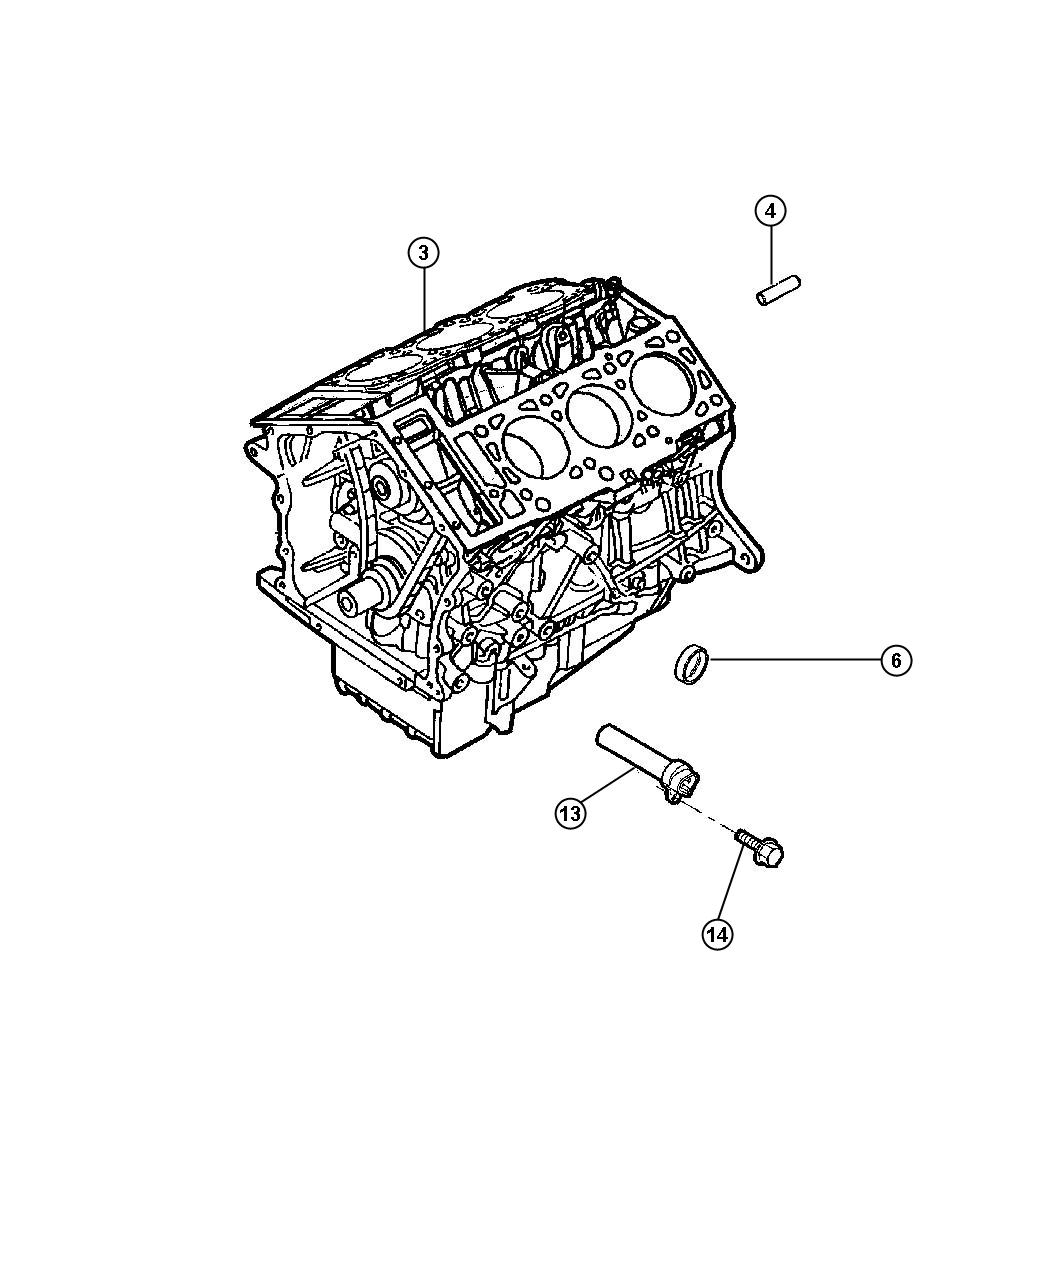 Dodge Stratus Engine. Long block. Remanufactured